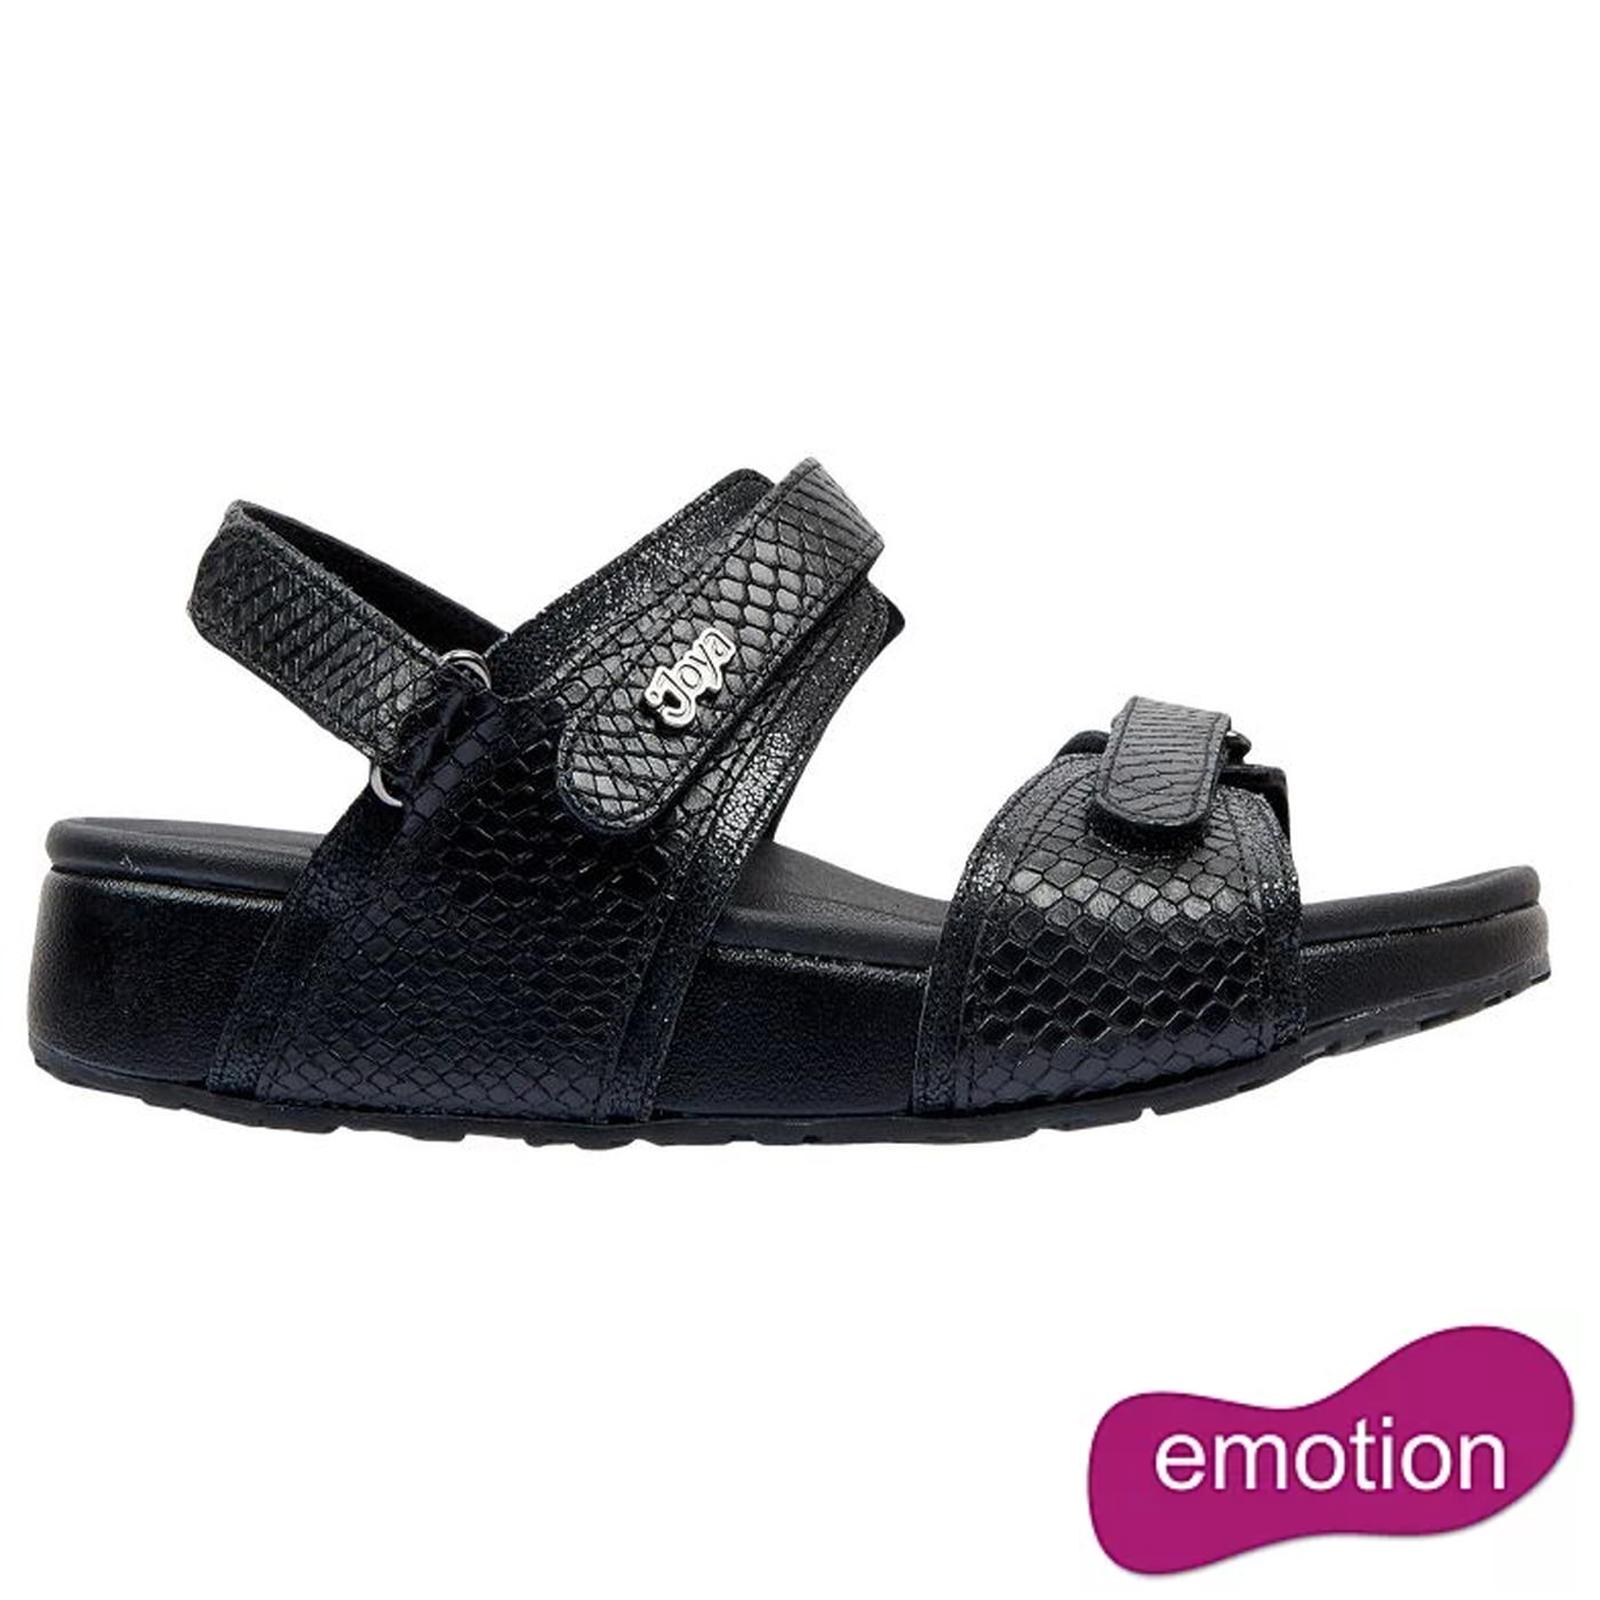 Joya Womens Amalfi Sandals - Black Snake